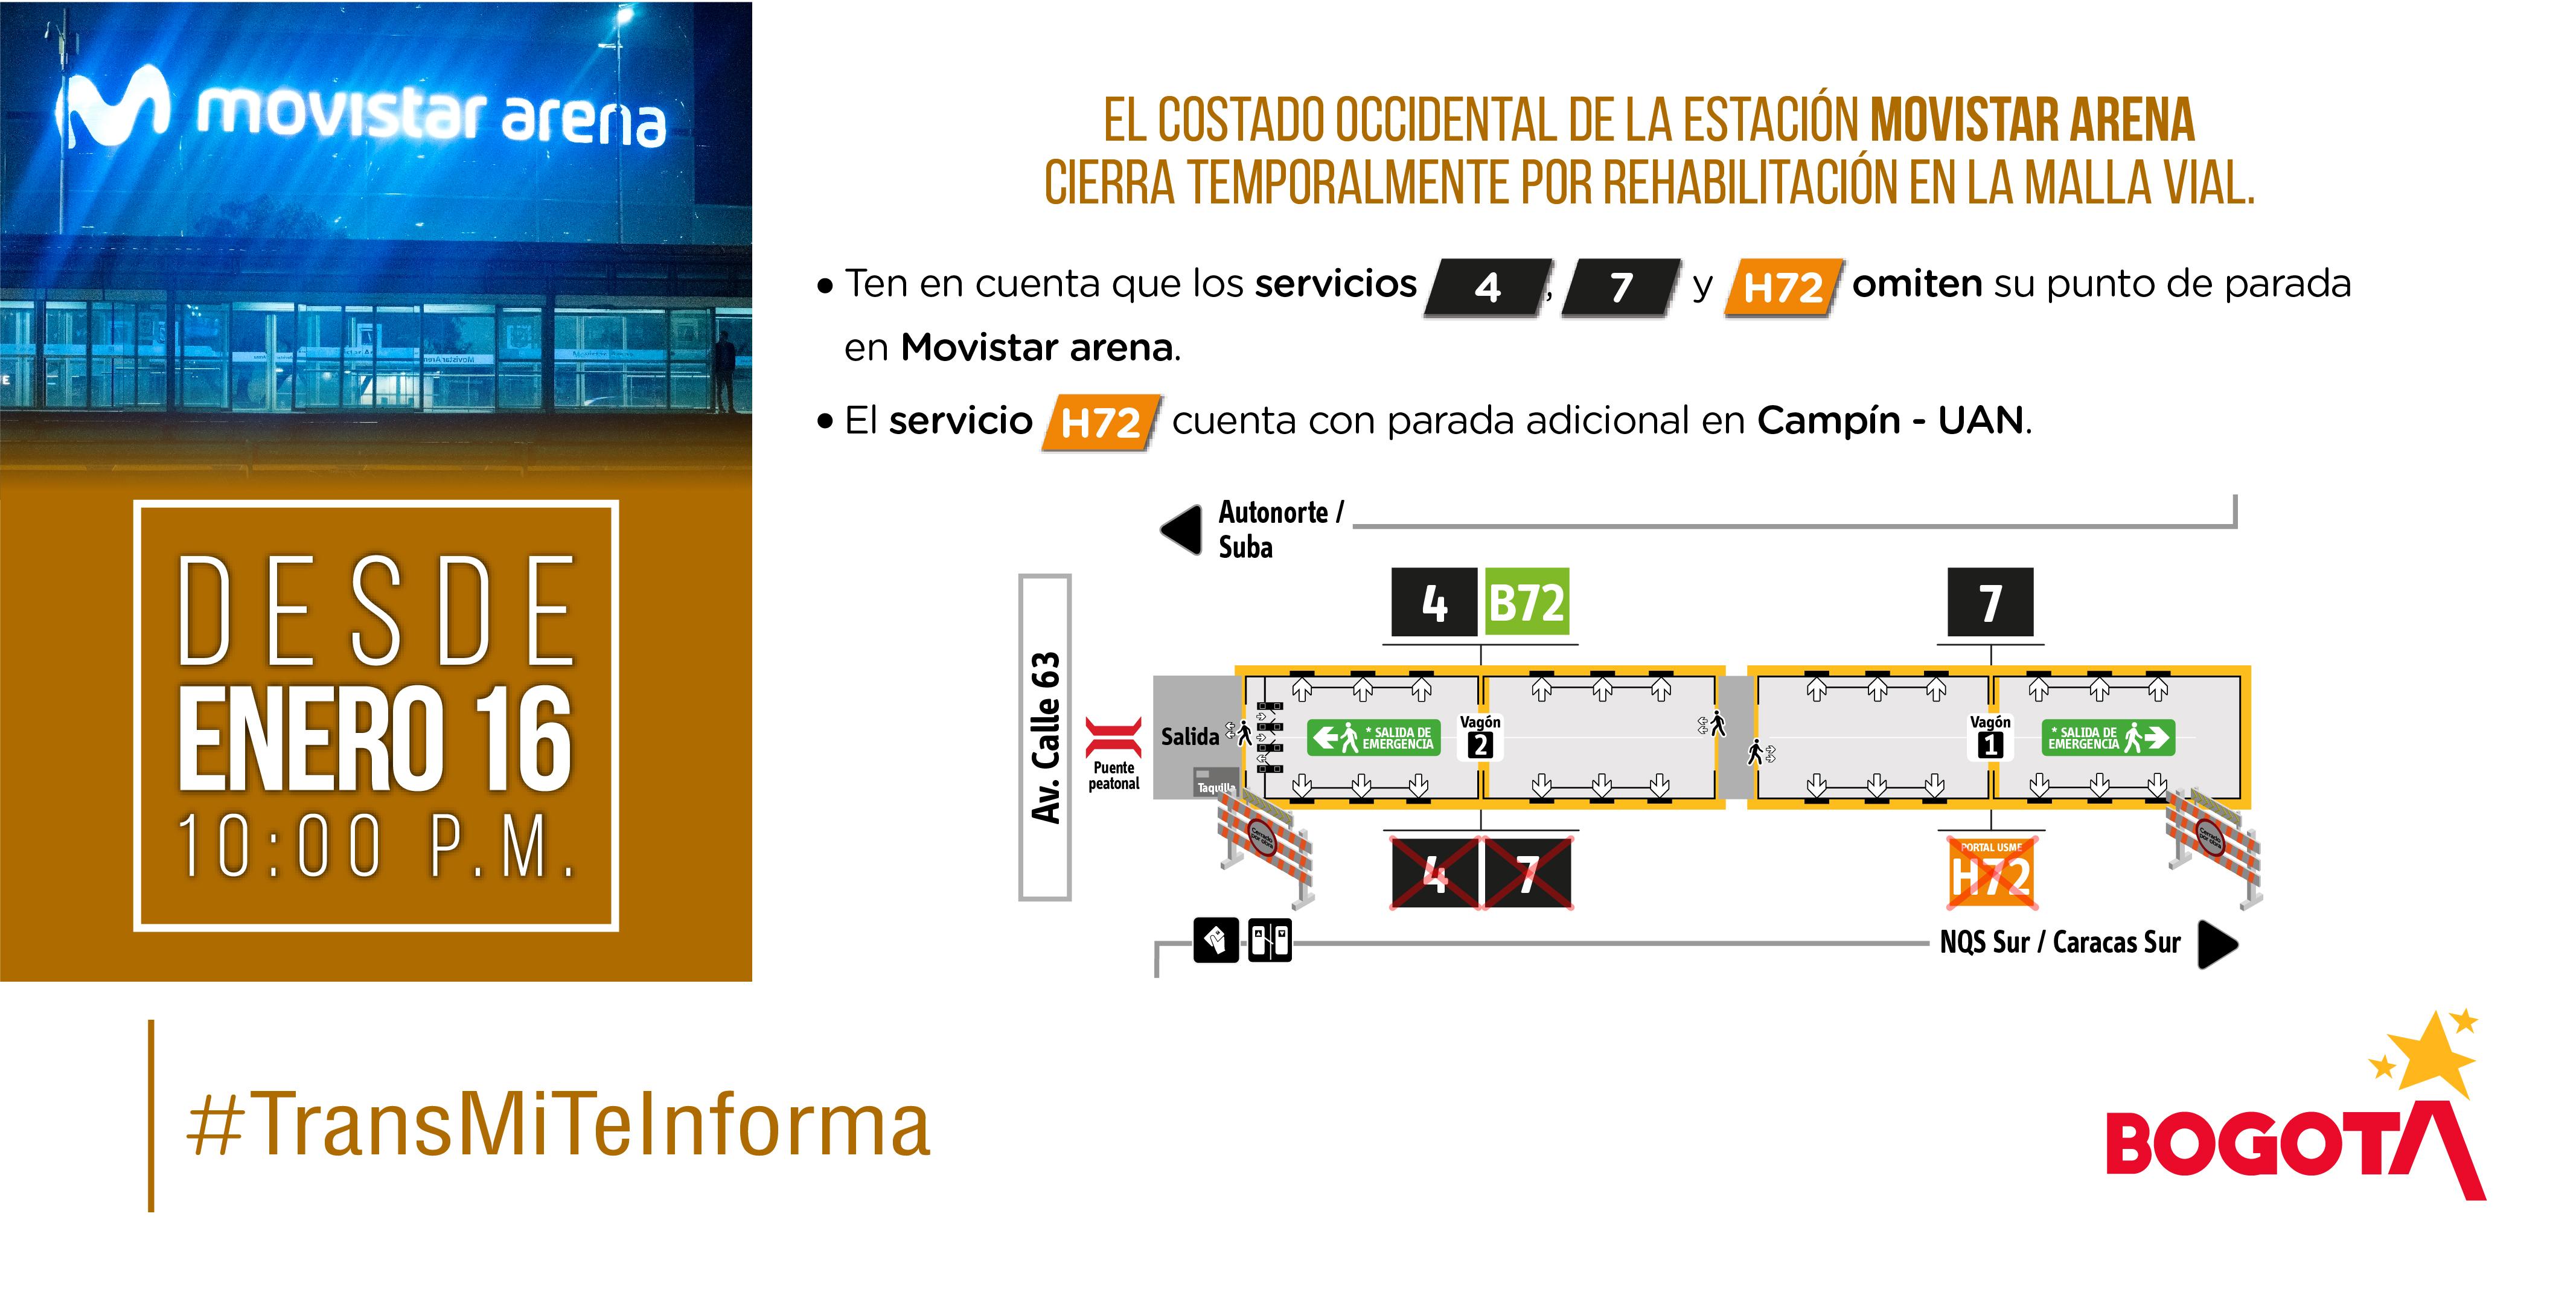 Plano de estación de Movistar Arena